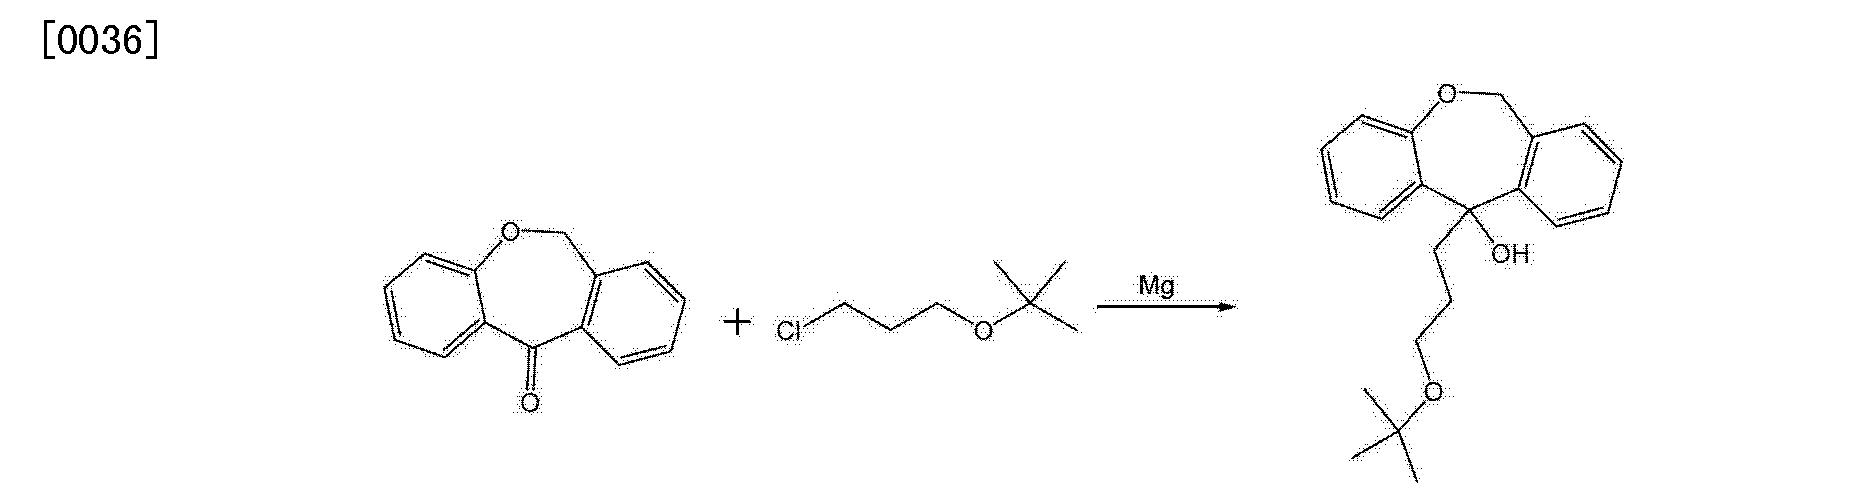 Figure CN102924424AD00052